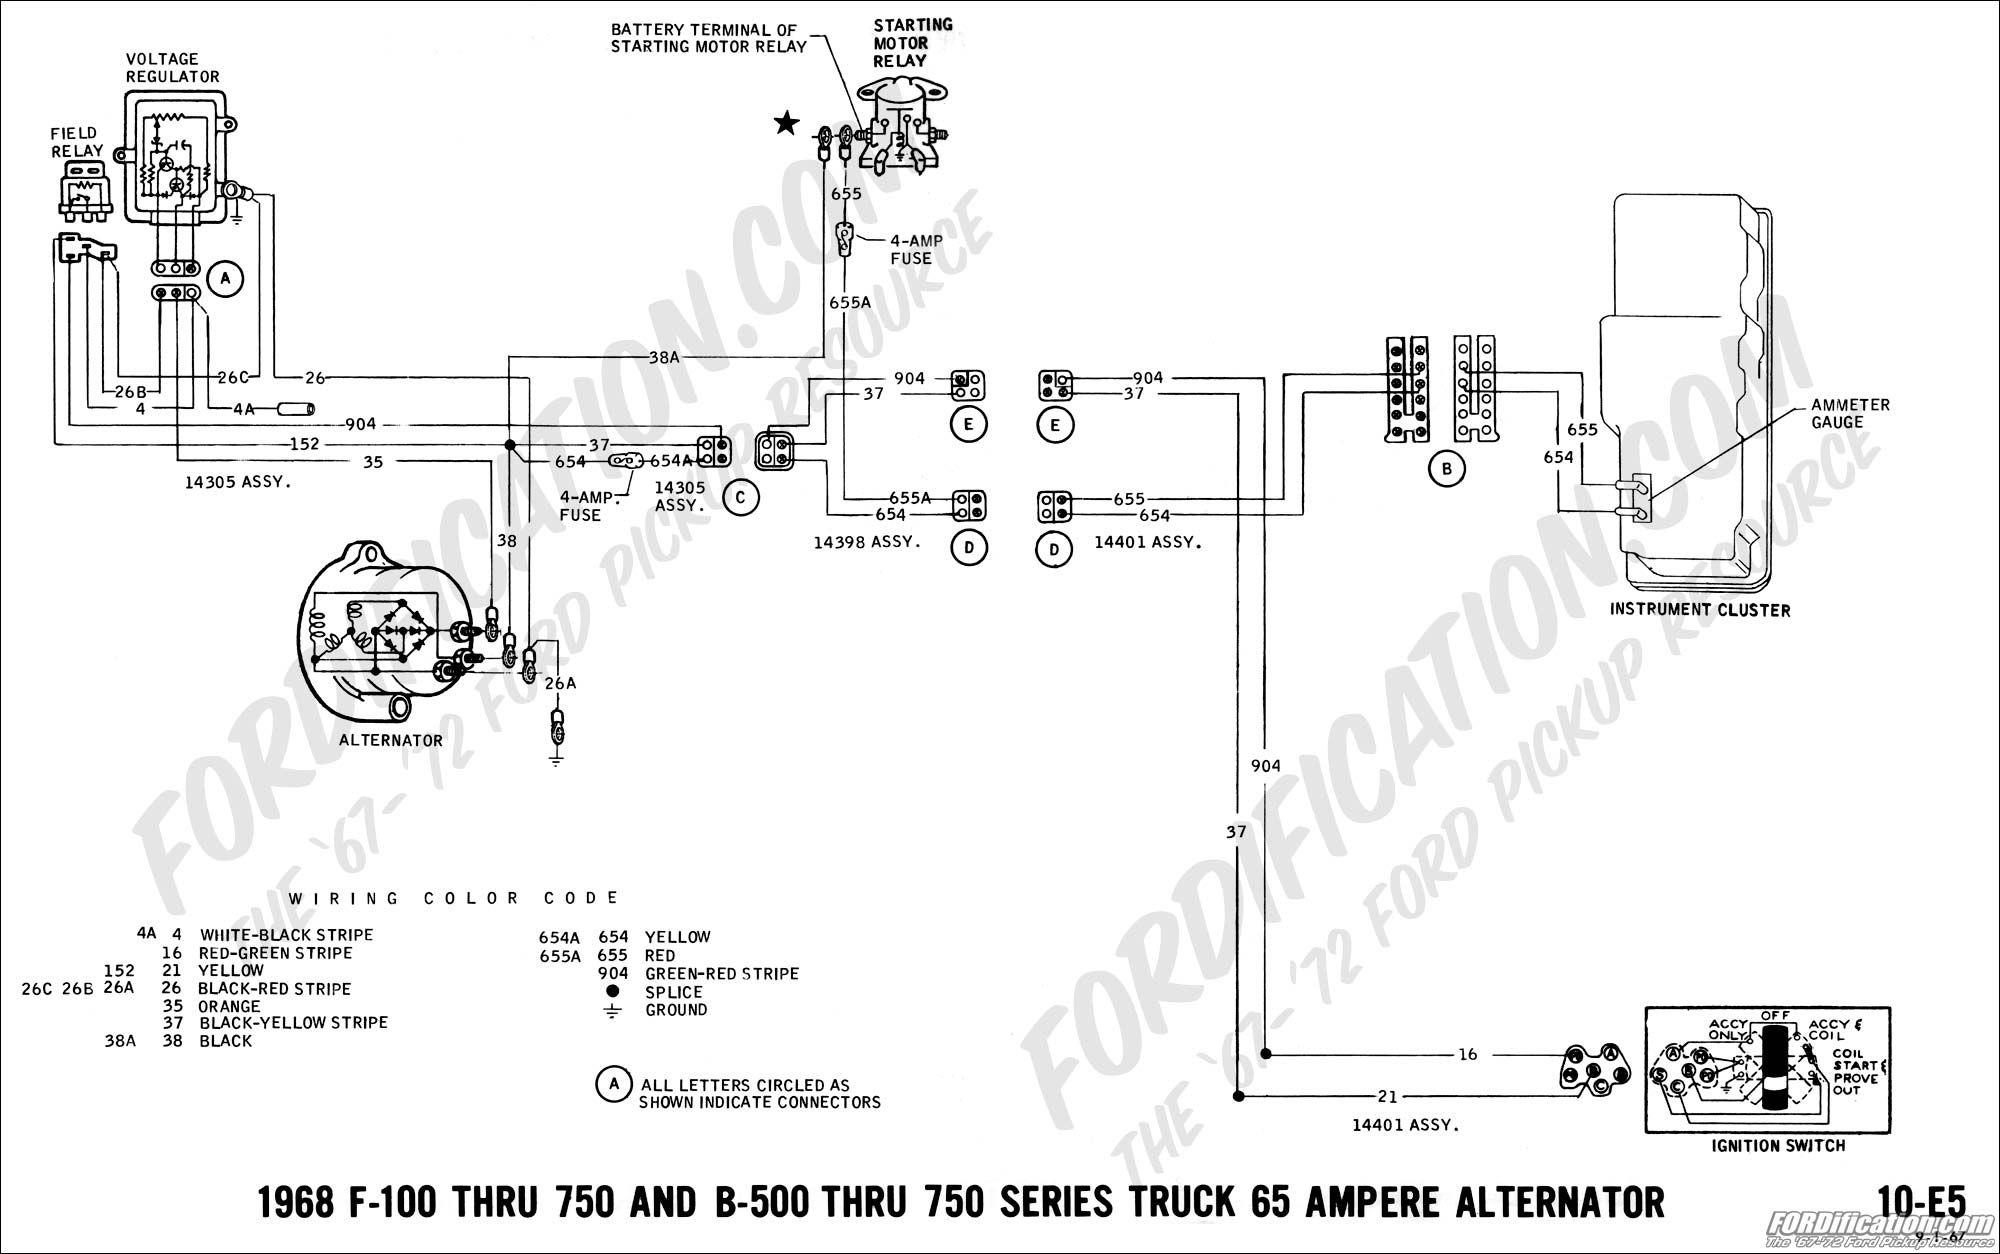 1977 Ford Truck Alternator Wiring - Wiring Diagram Data - Alternator Wiring Diagram